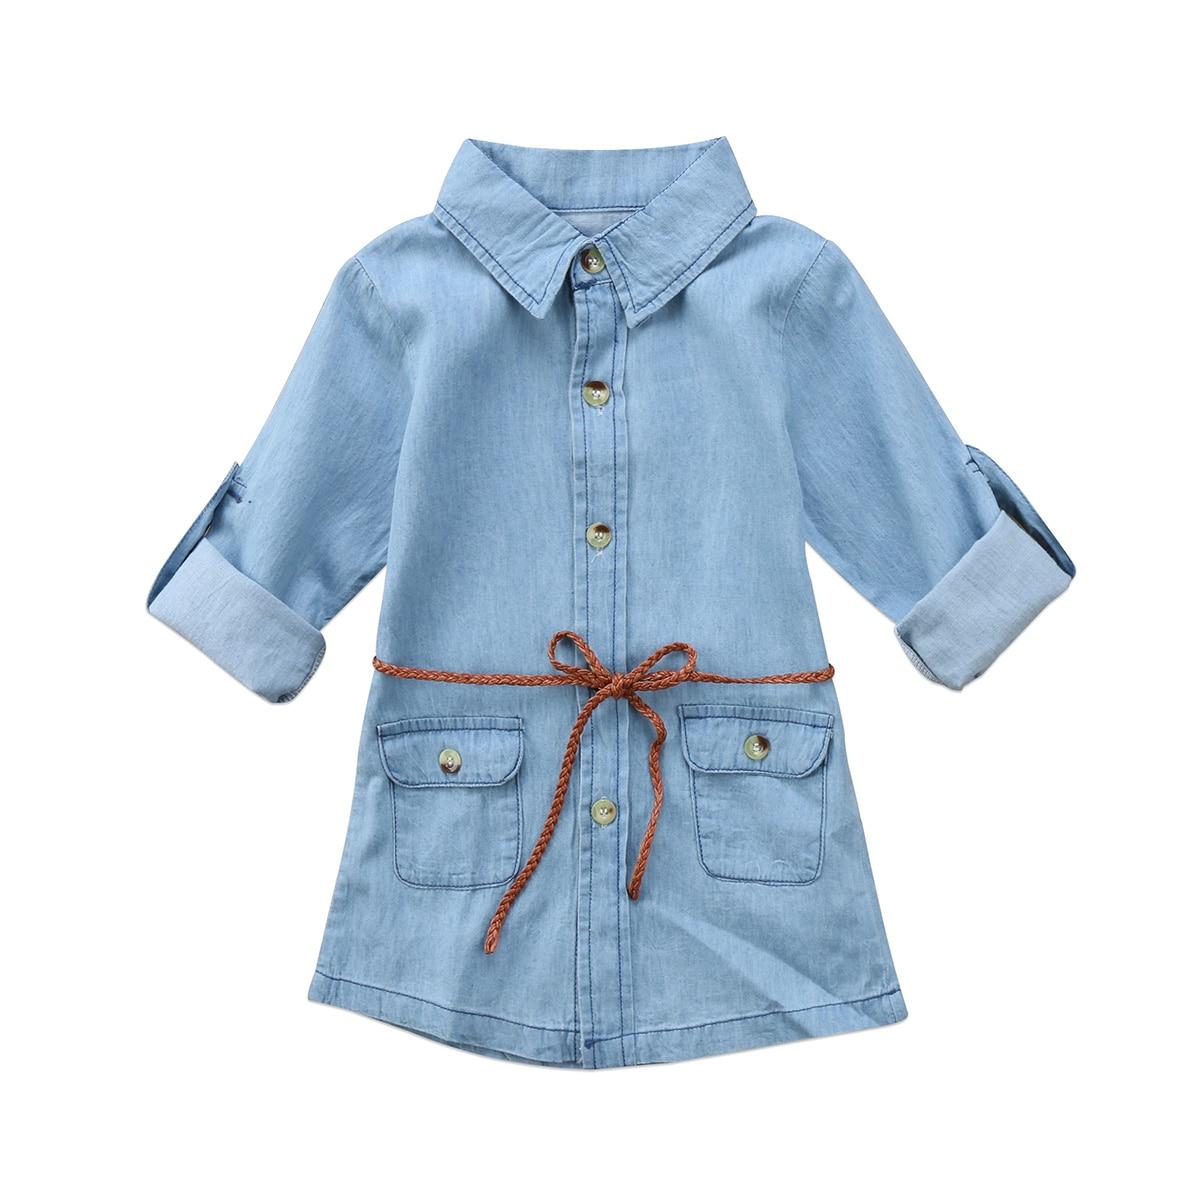 06503c2d89 Girls Short Mini Dresses Jean Long Sleeve Belt Cute Casual Party Shirt Dress  Baby Kids Girl Clothing Denim